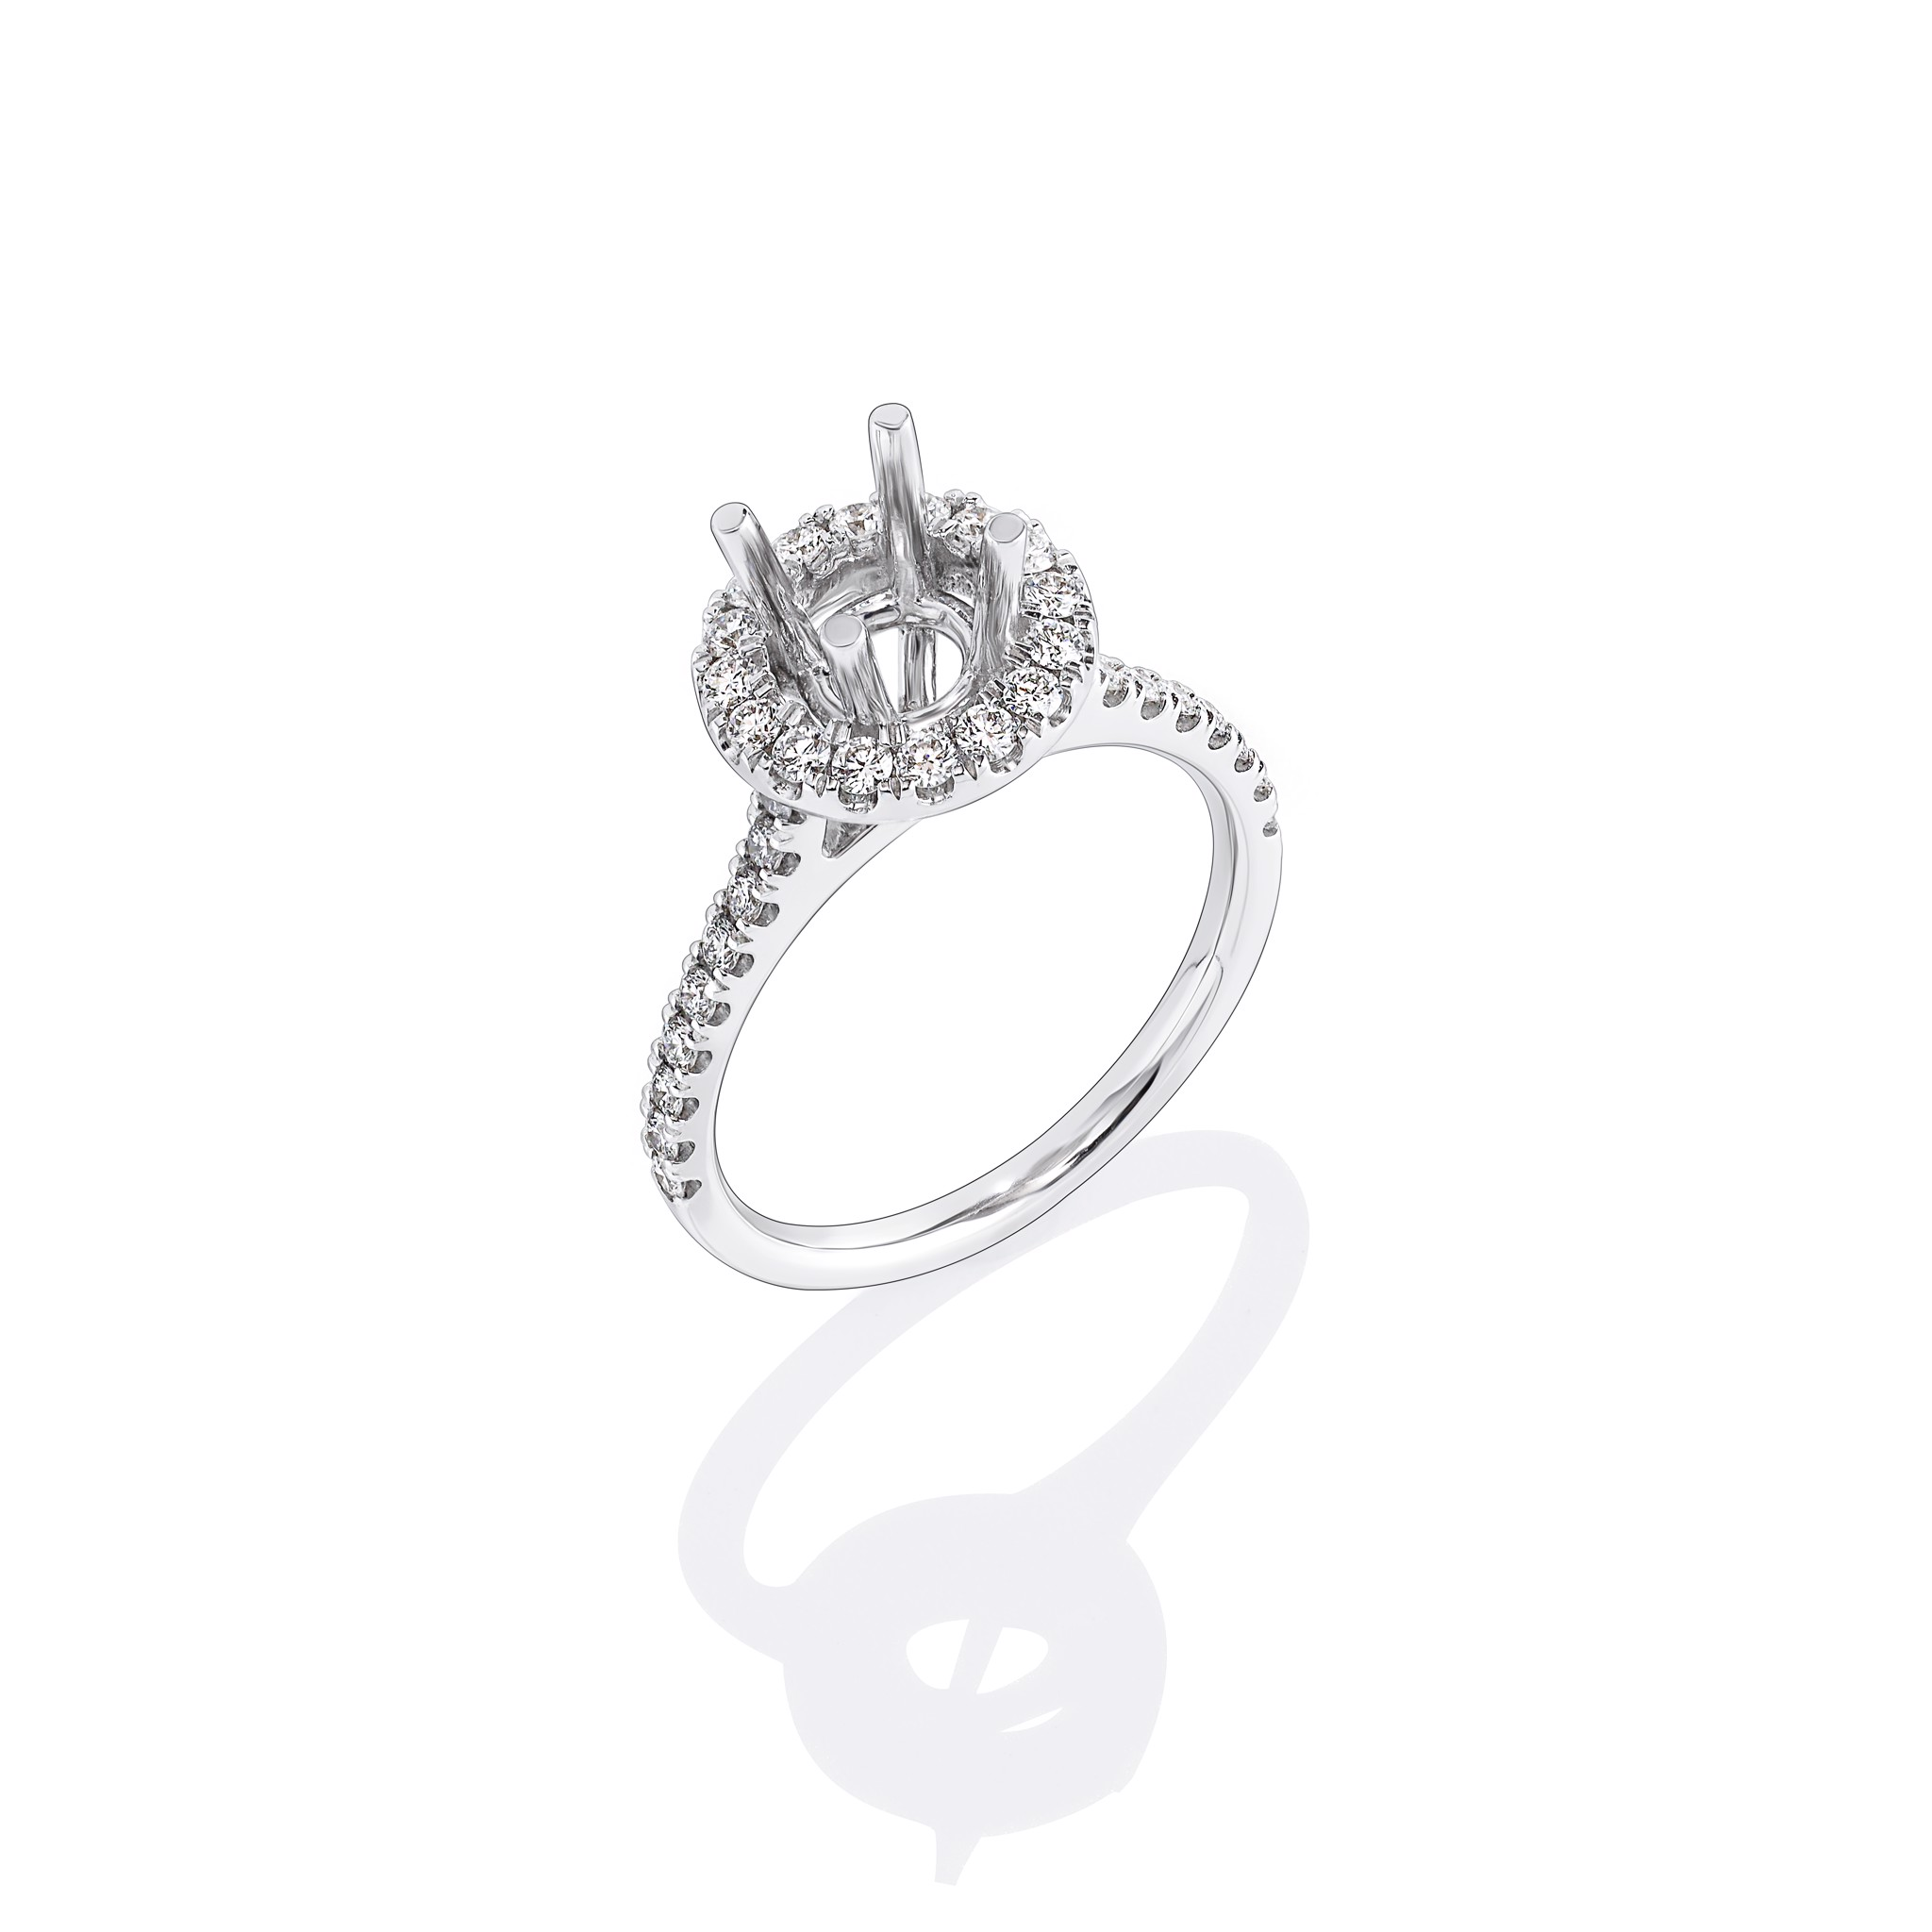 Ổ nhẫn kim cương 00520290